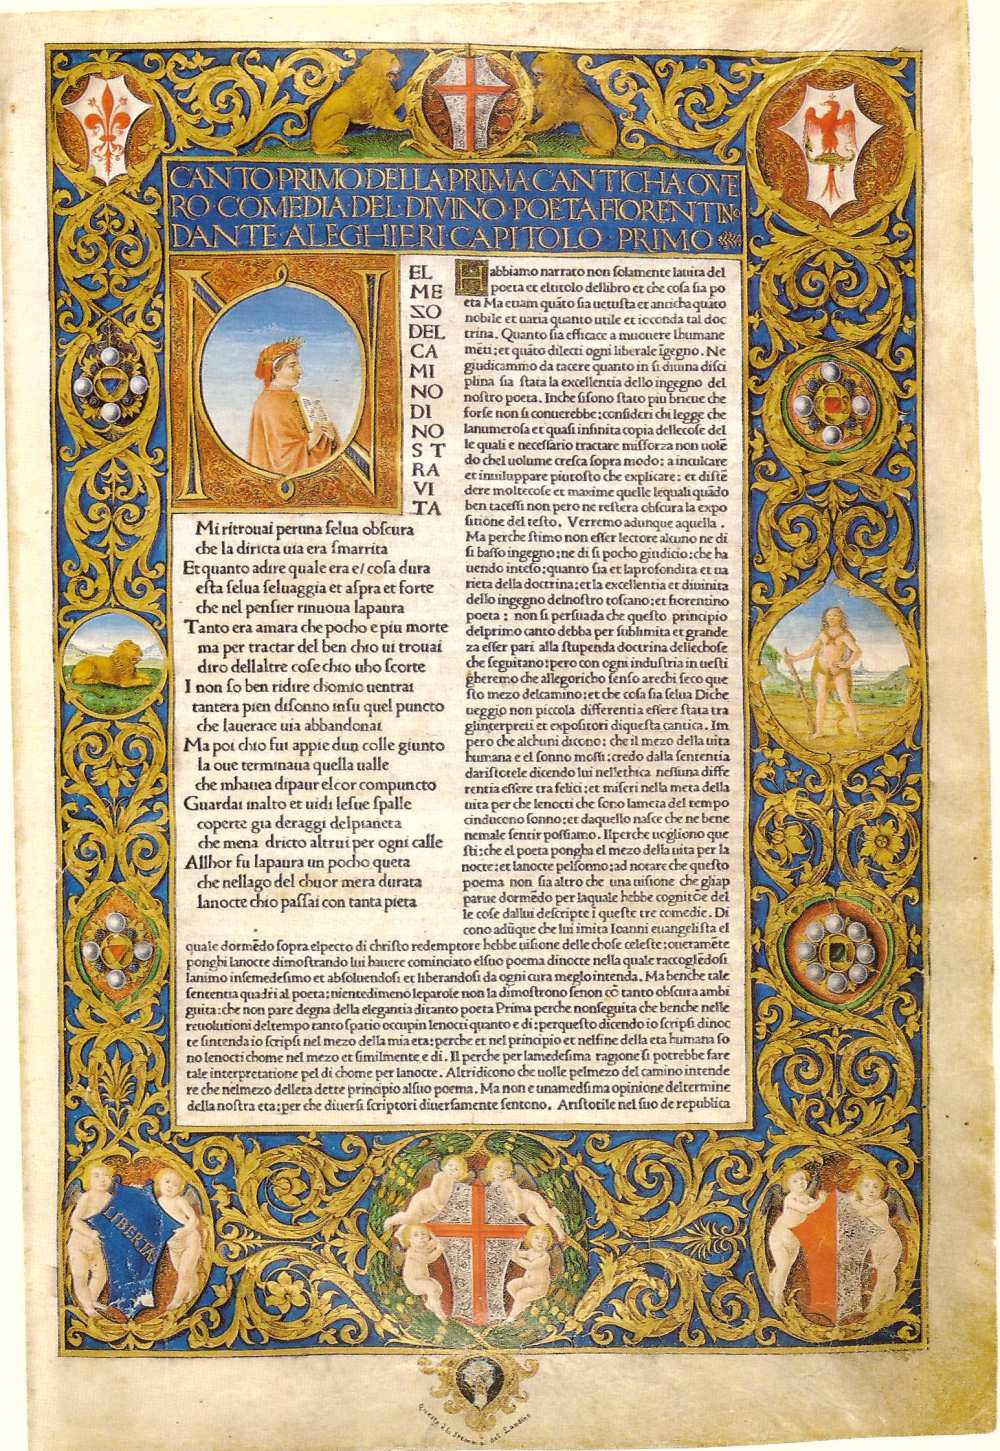 Firenze, Biblioteca Nazionale Centrale: Banco Rari 341. A kép forrása: Internet Archive https://archive.org/details/b.-r.-341-jpeg/page/n31/mode/2up